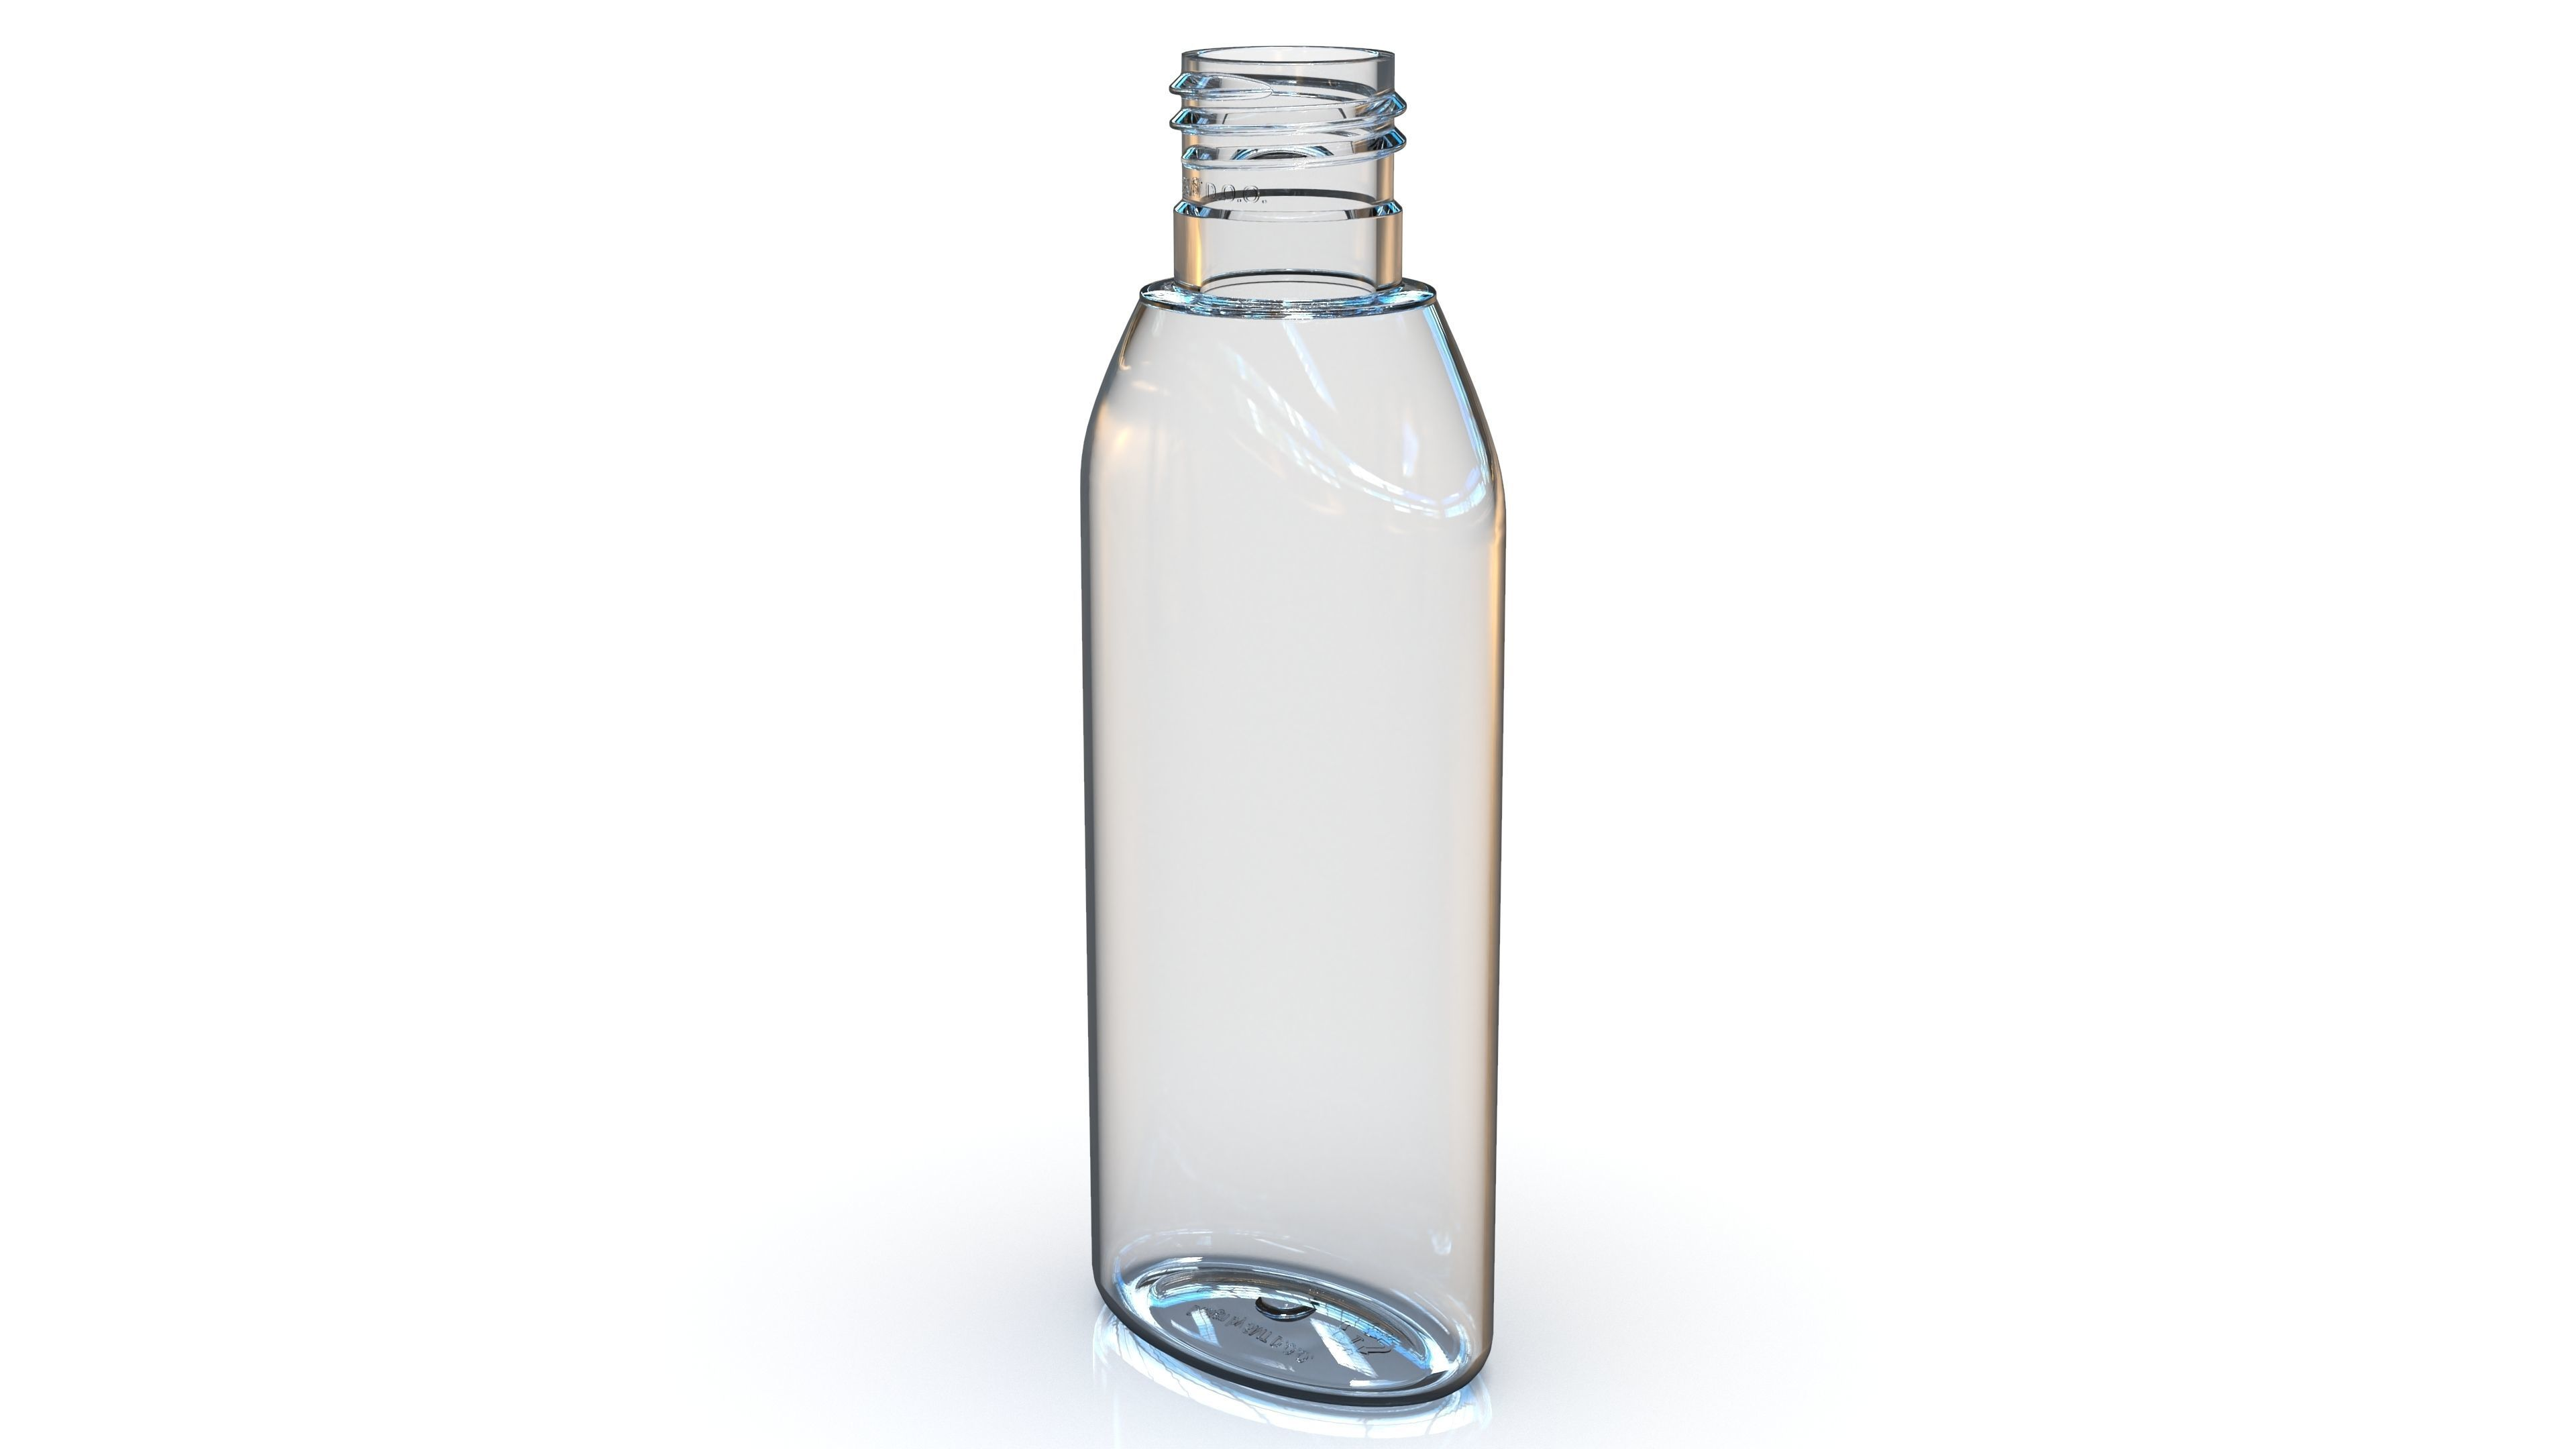 PET Bottle SP - 415 - 15 - M 30 mL - for water - drinks - etc